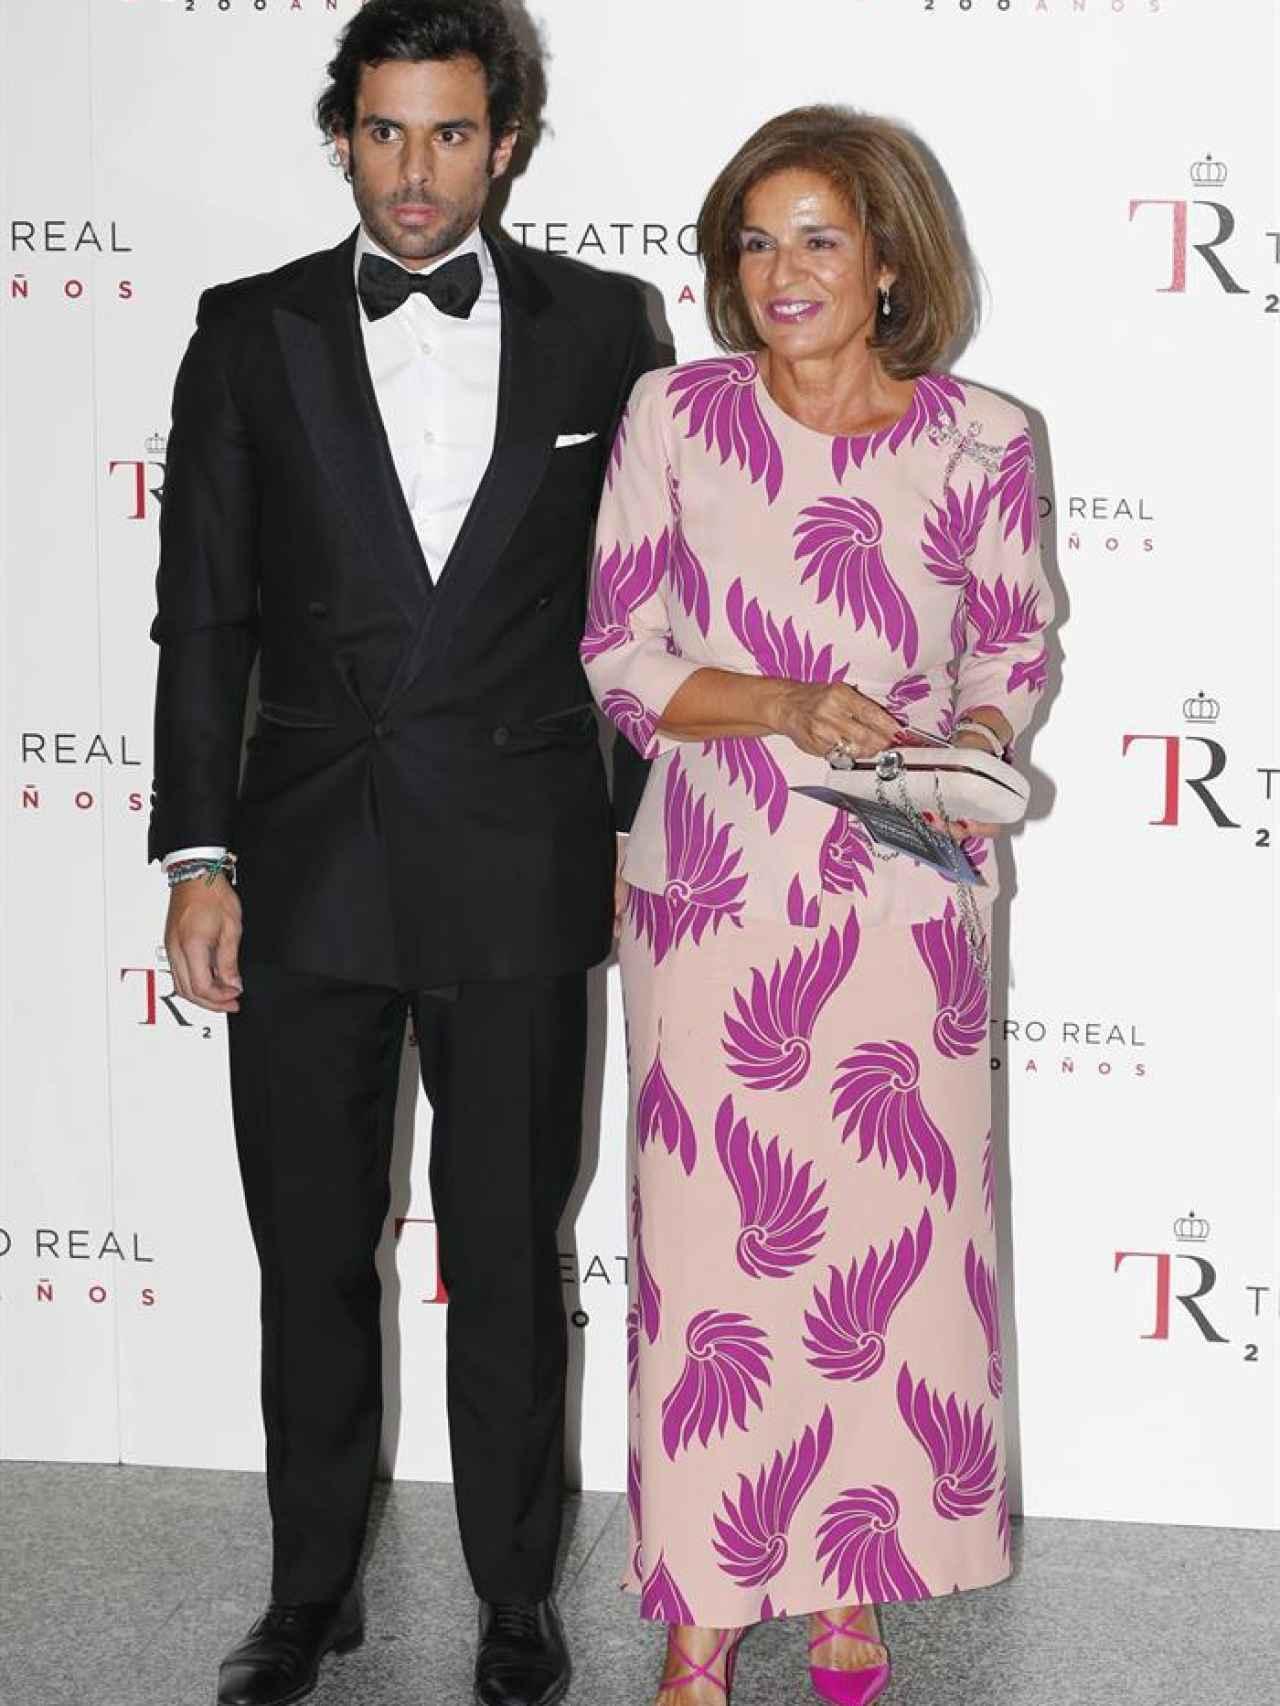 Ana Botella y su hijo Alonso Aznar